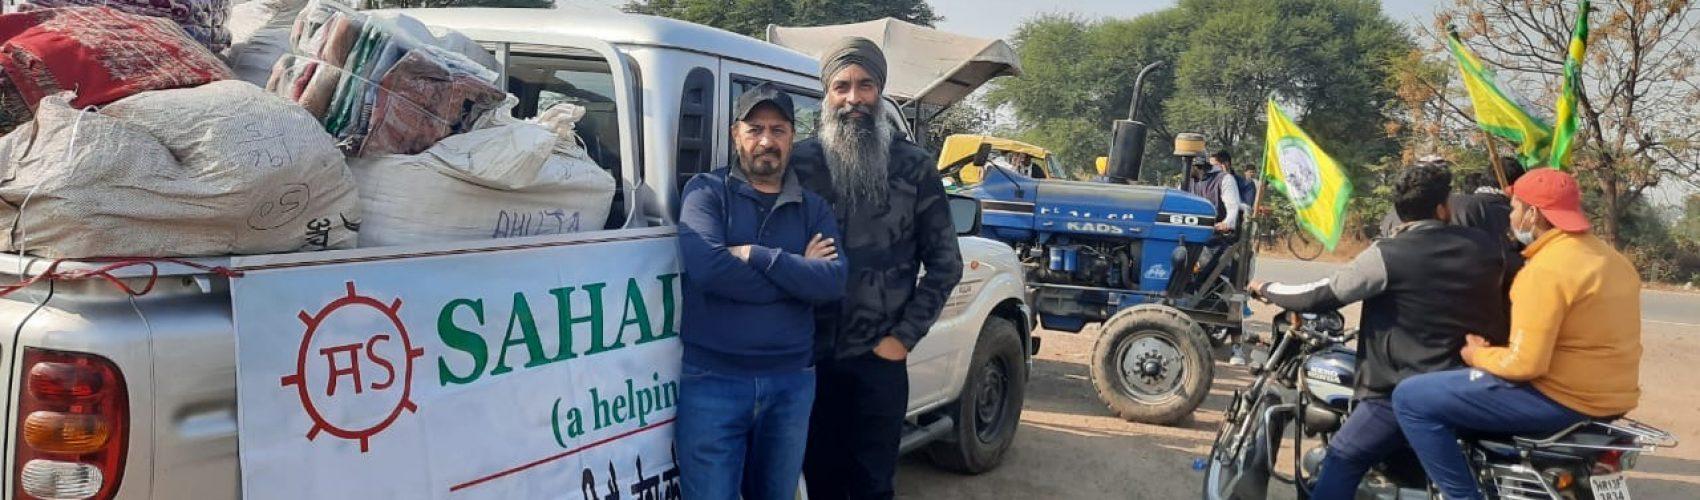 Header pic - Sahaita in Delhi